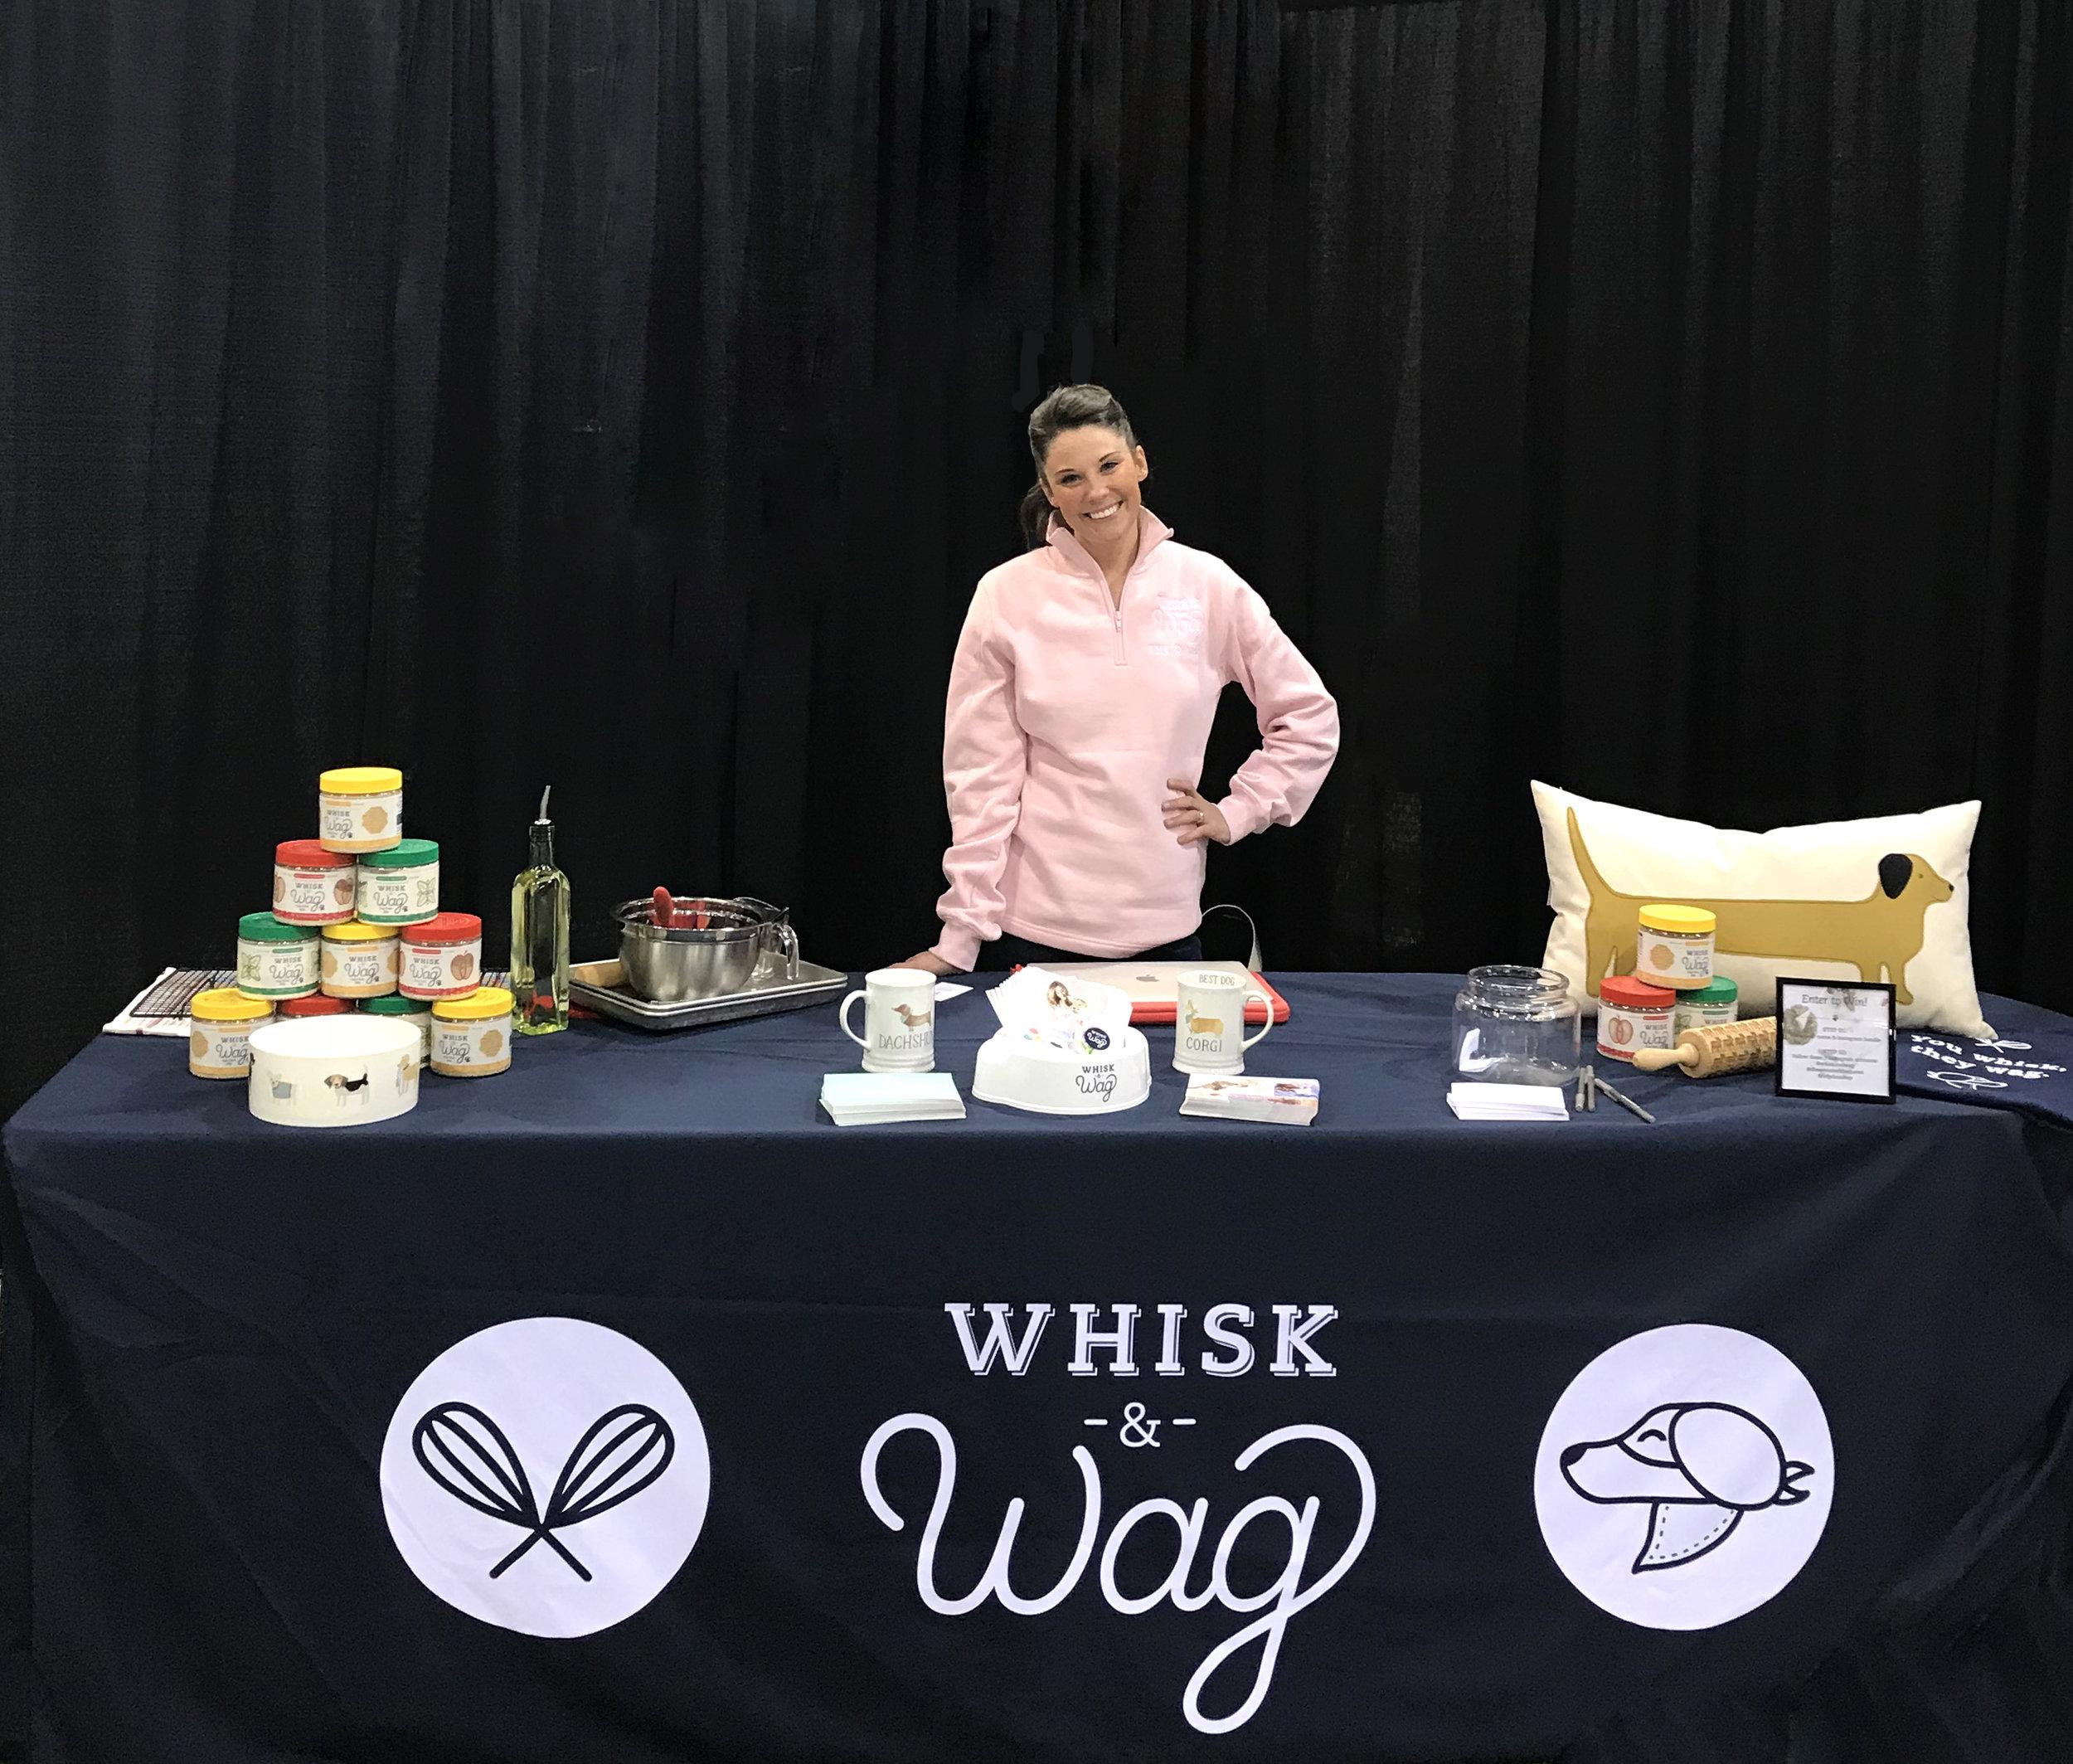 Whisk & Wag at BlogPaws 2018